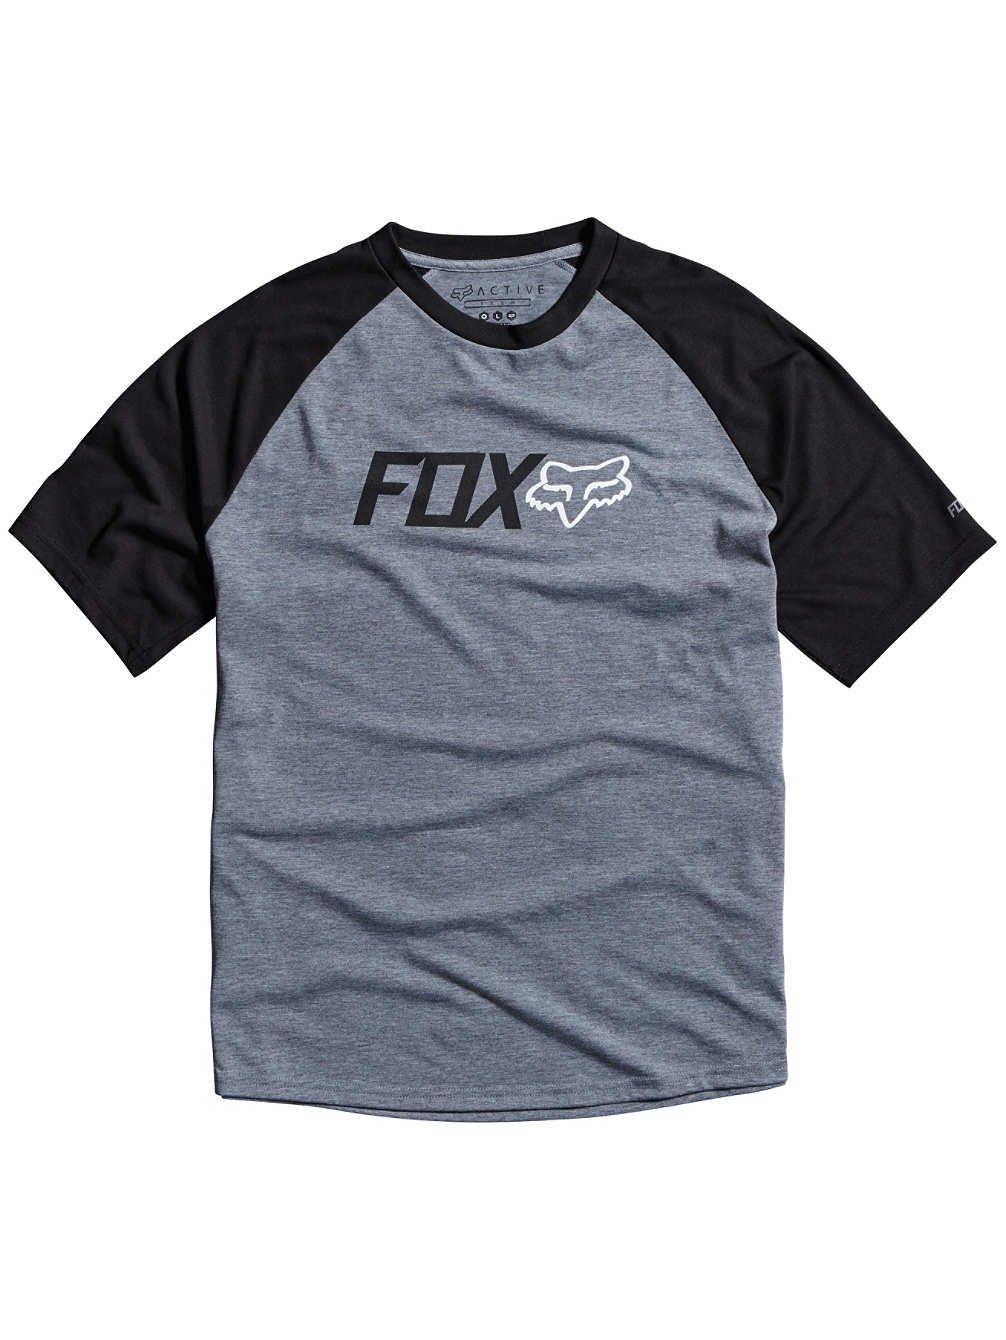 FMF Racing Men s Scrub Snapback Hat - DirtRider   MX   Off-Road Gear ... 7a4680d70a17